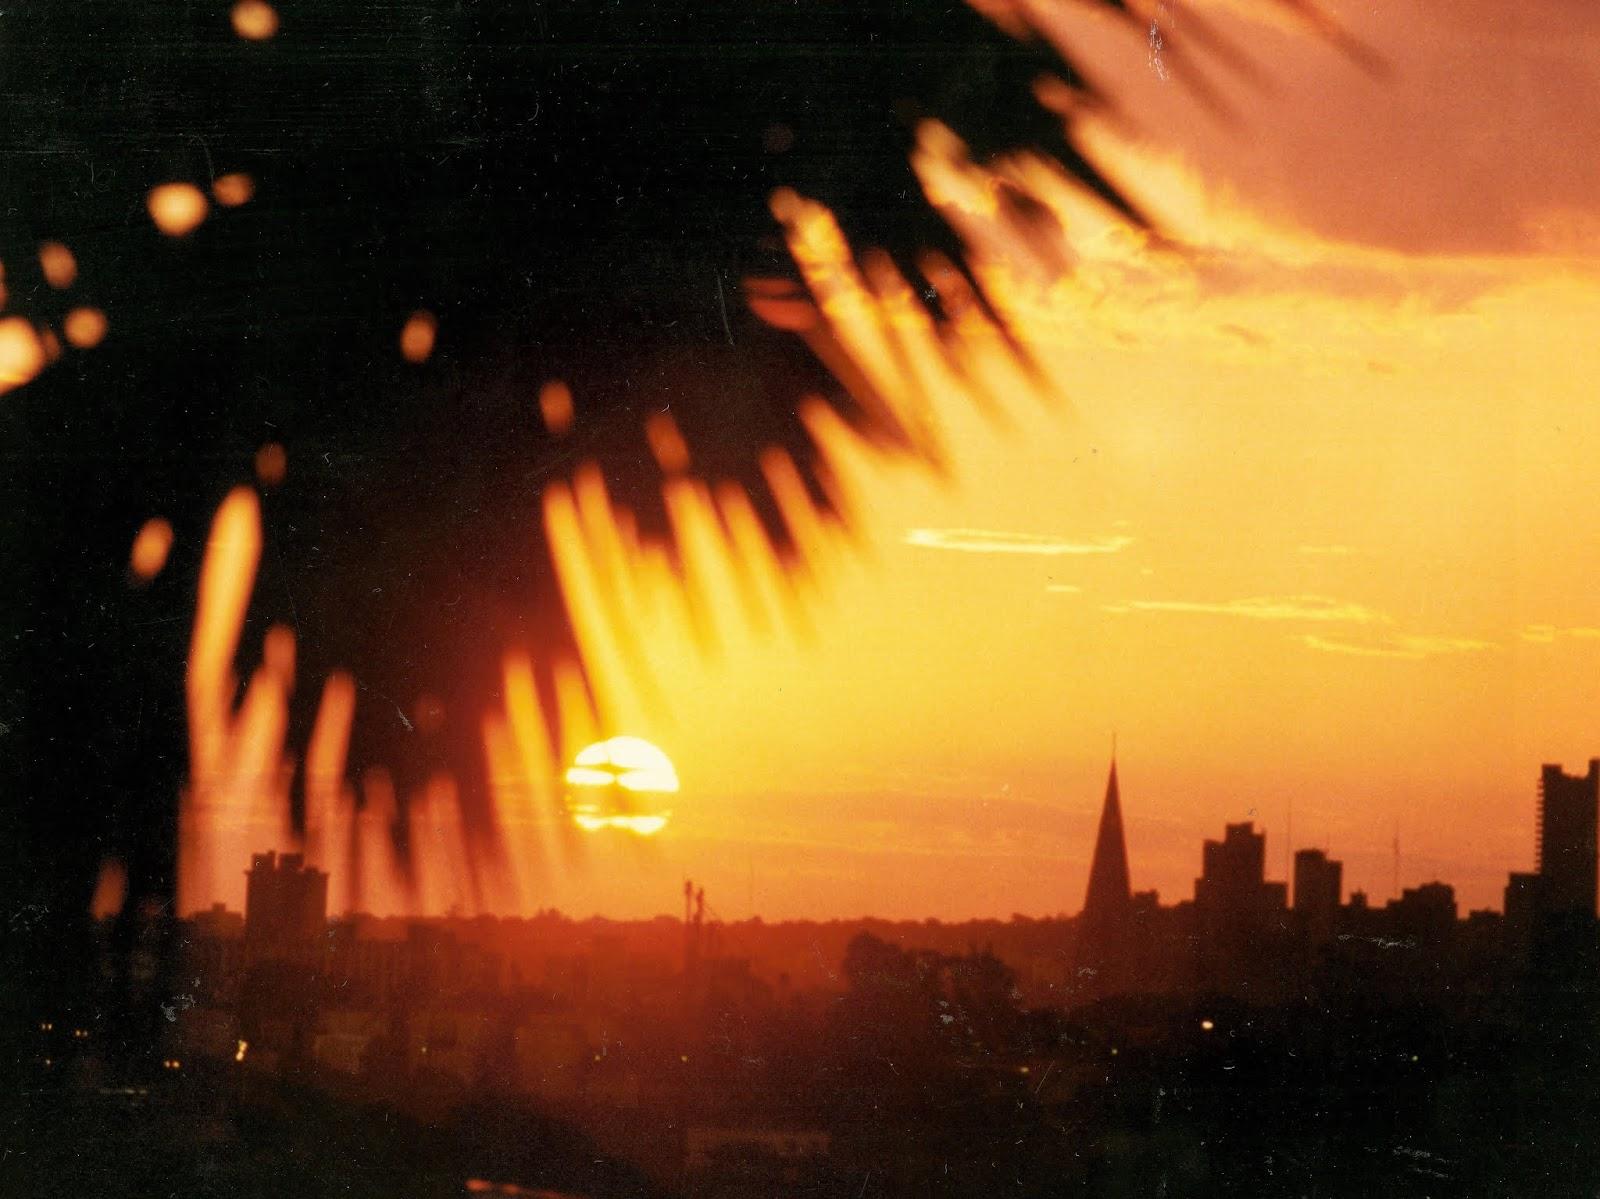 Pôr do sol em Maringá - 1995